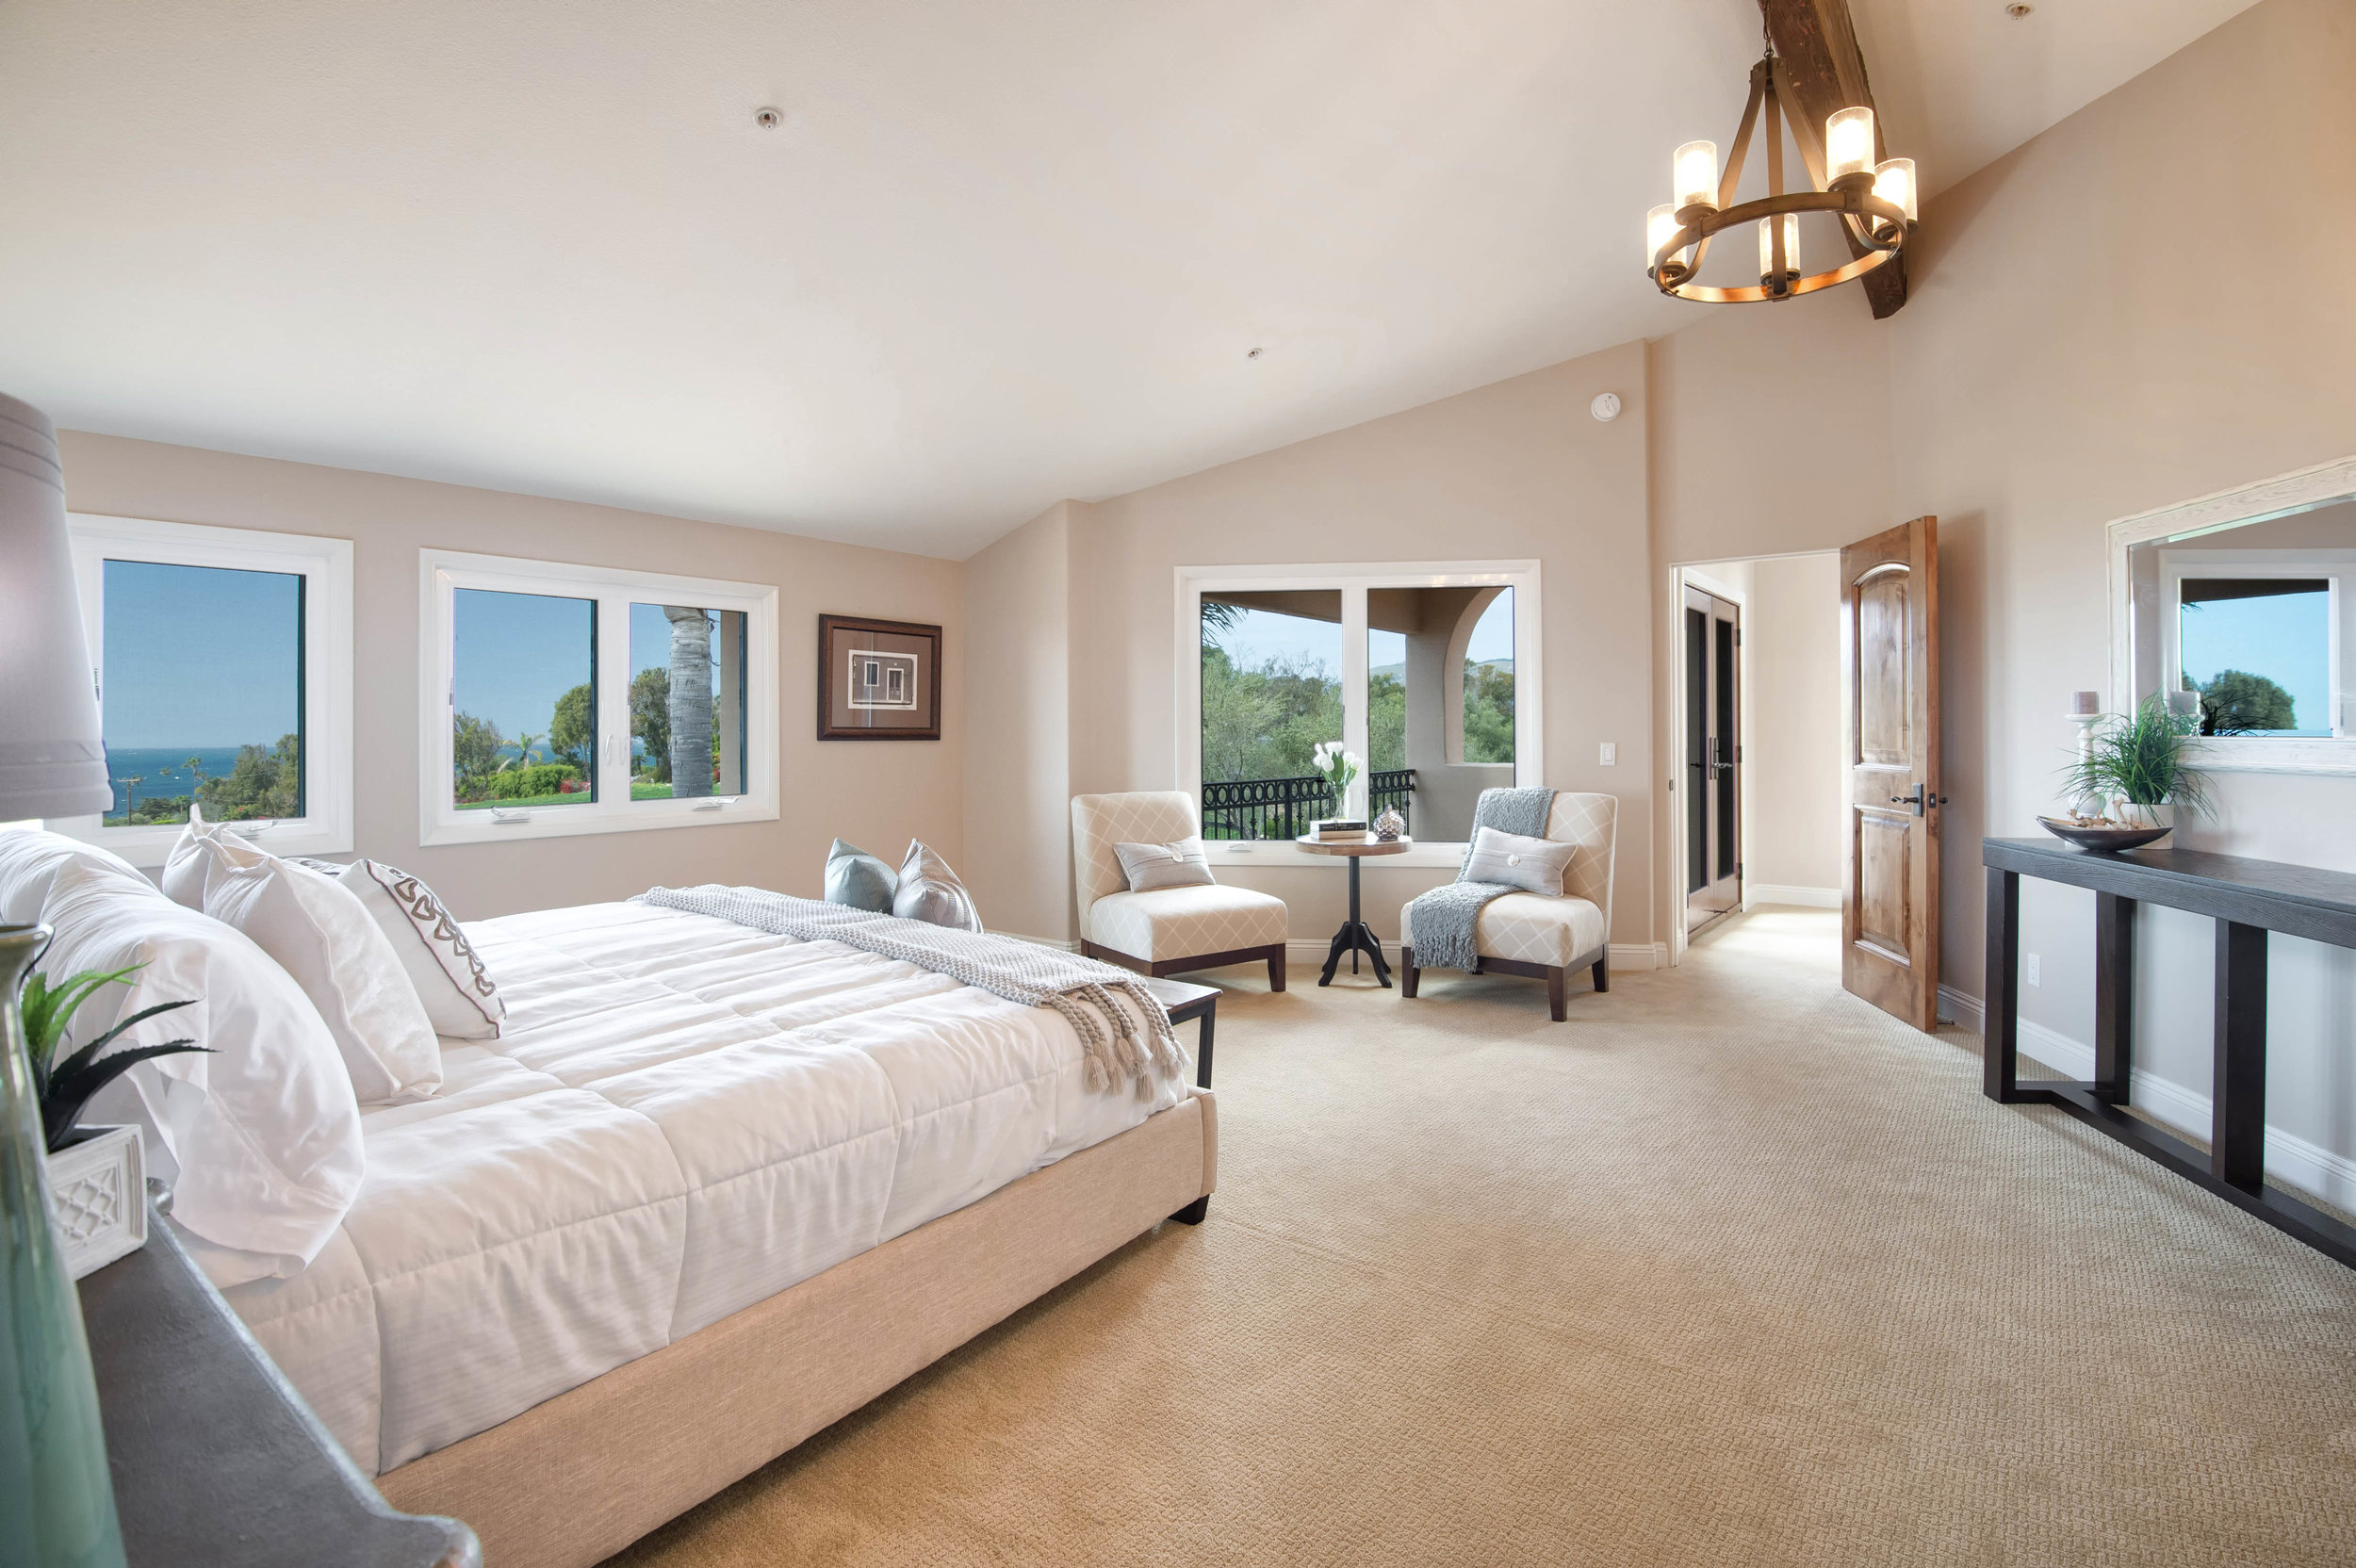 010 6130 Via Cabrillo For Sale Lease The Malibu Life Team Luxury Real Estate.jpg